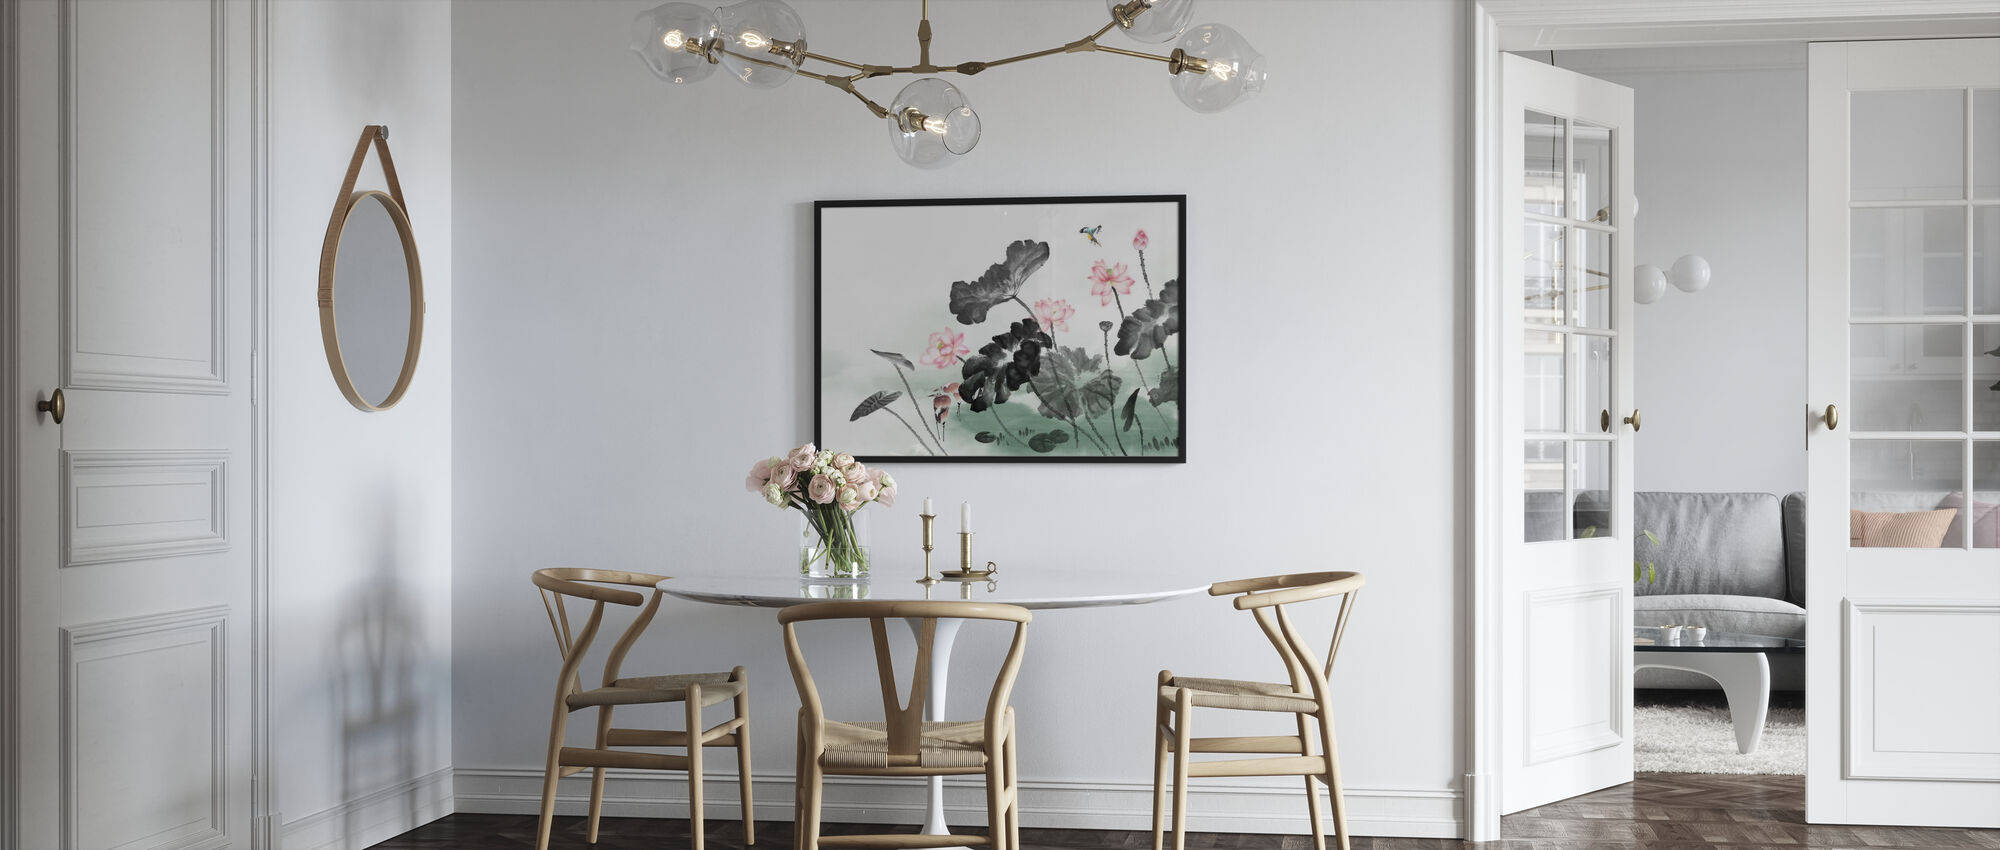 La Felur - Poster - Kitchen